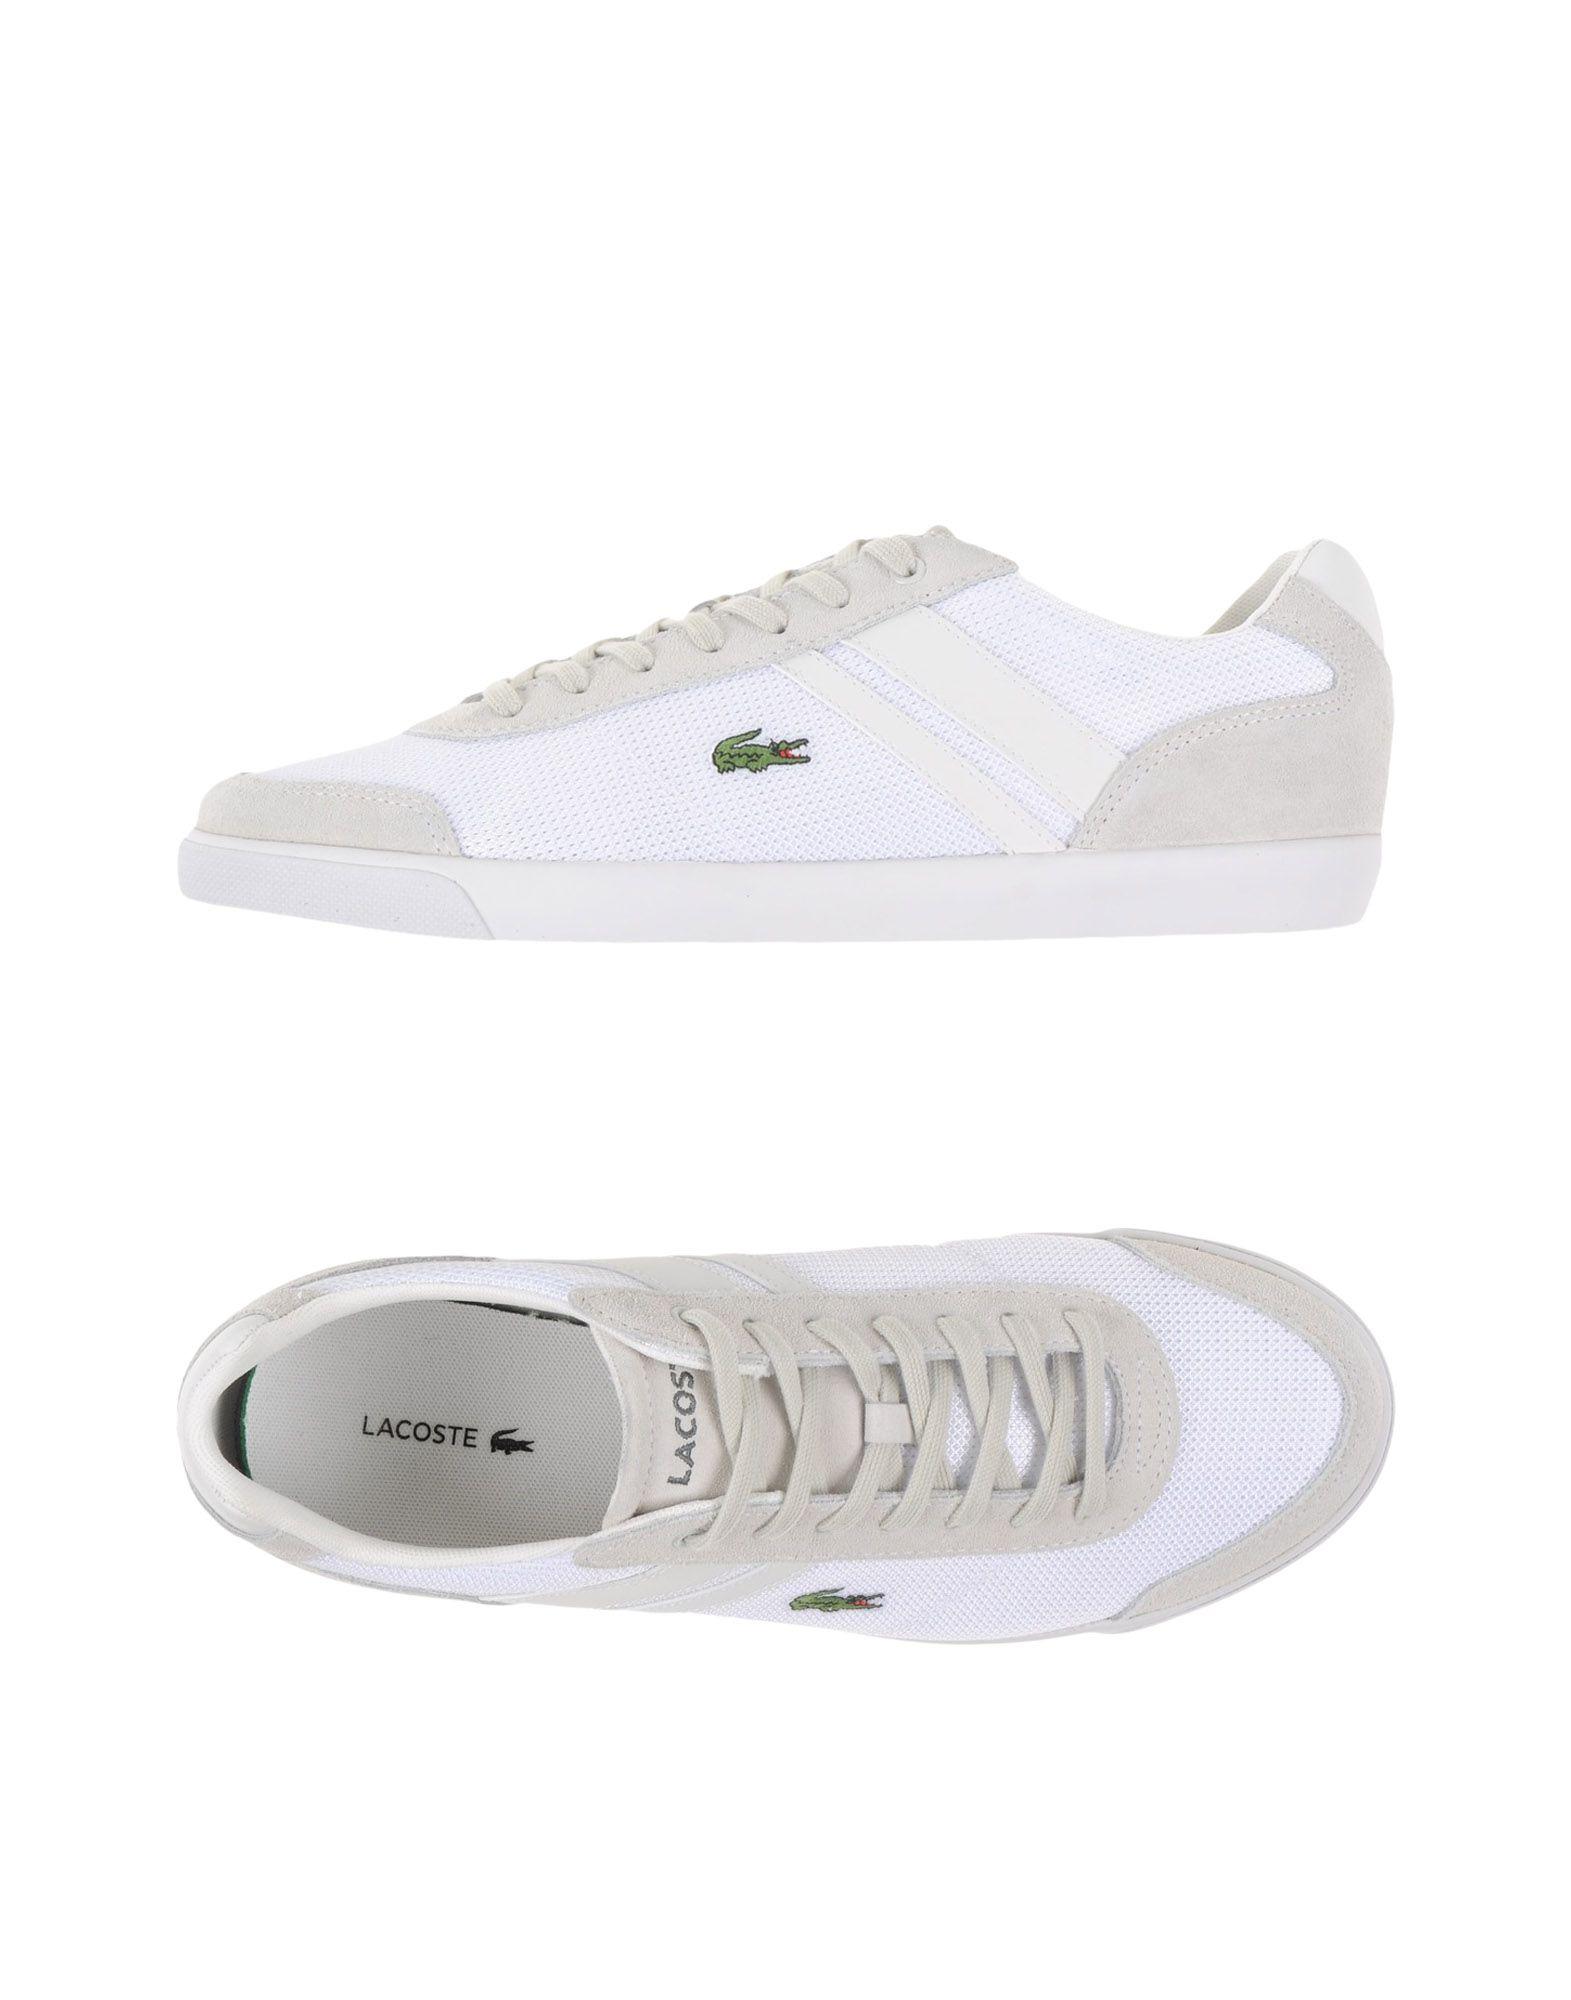 Sneakers Lacoste Comba 116 1 - Uomo - 11008155IA